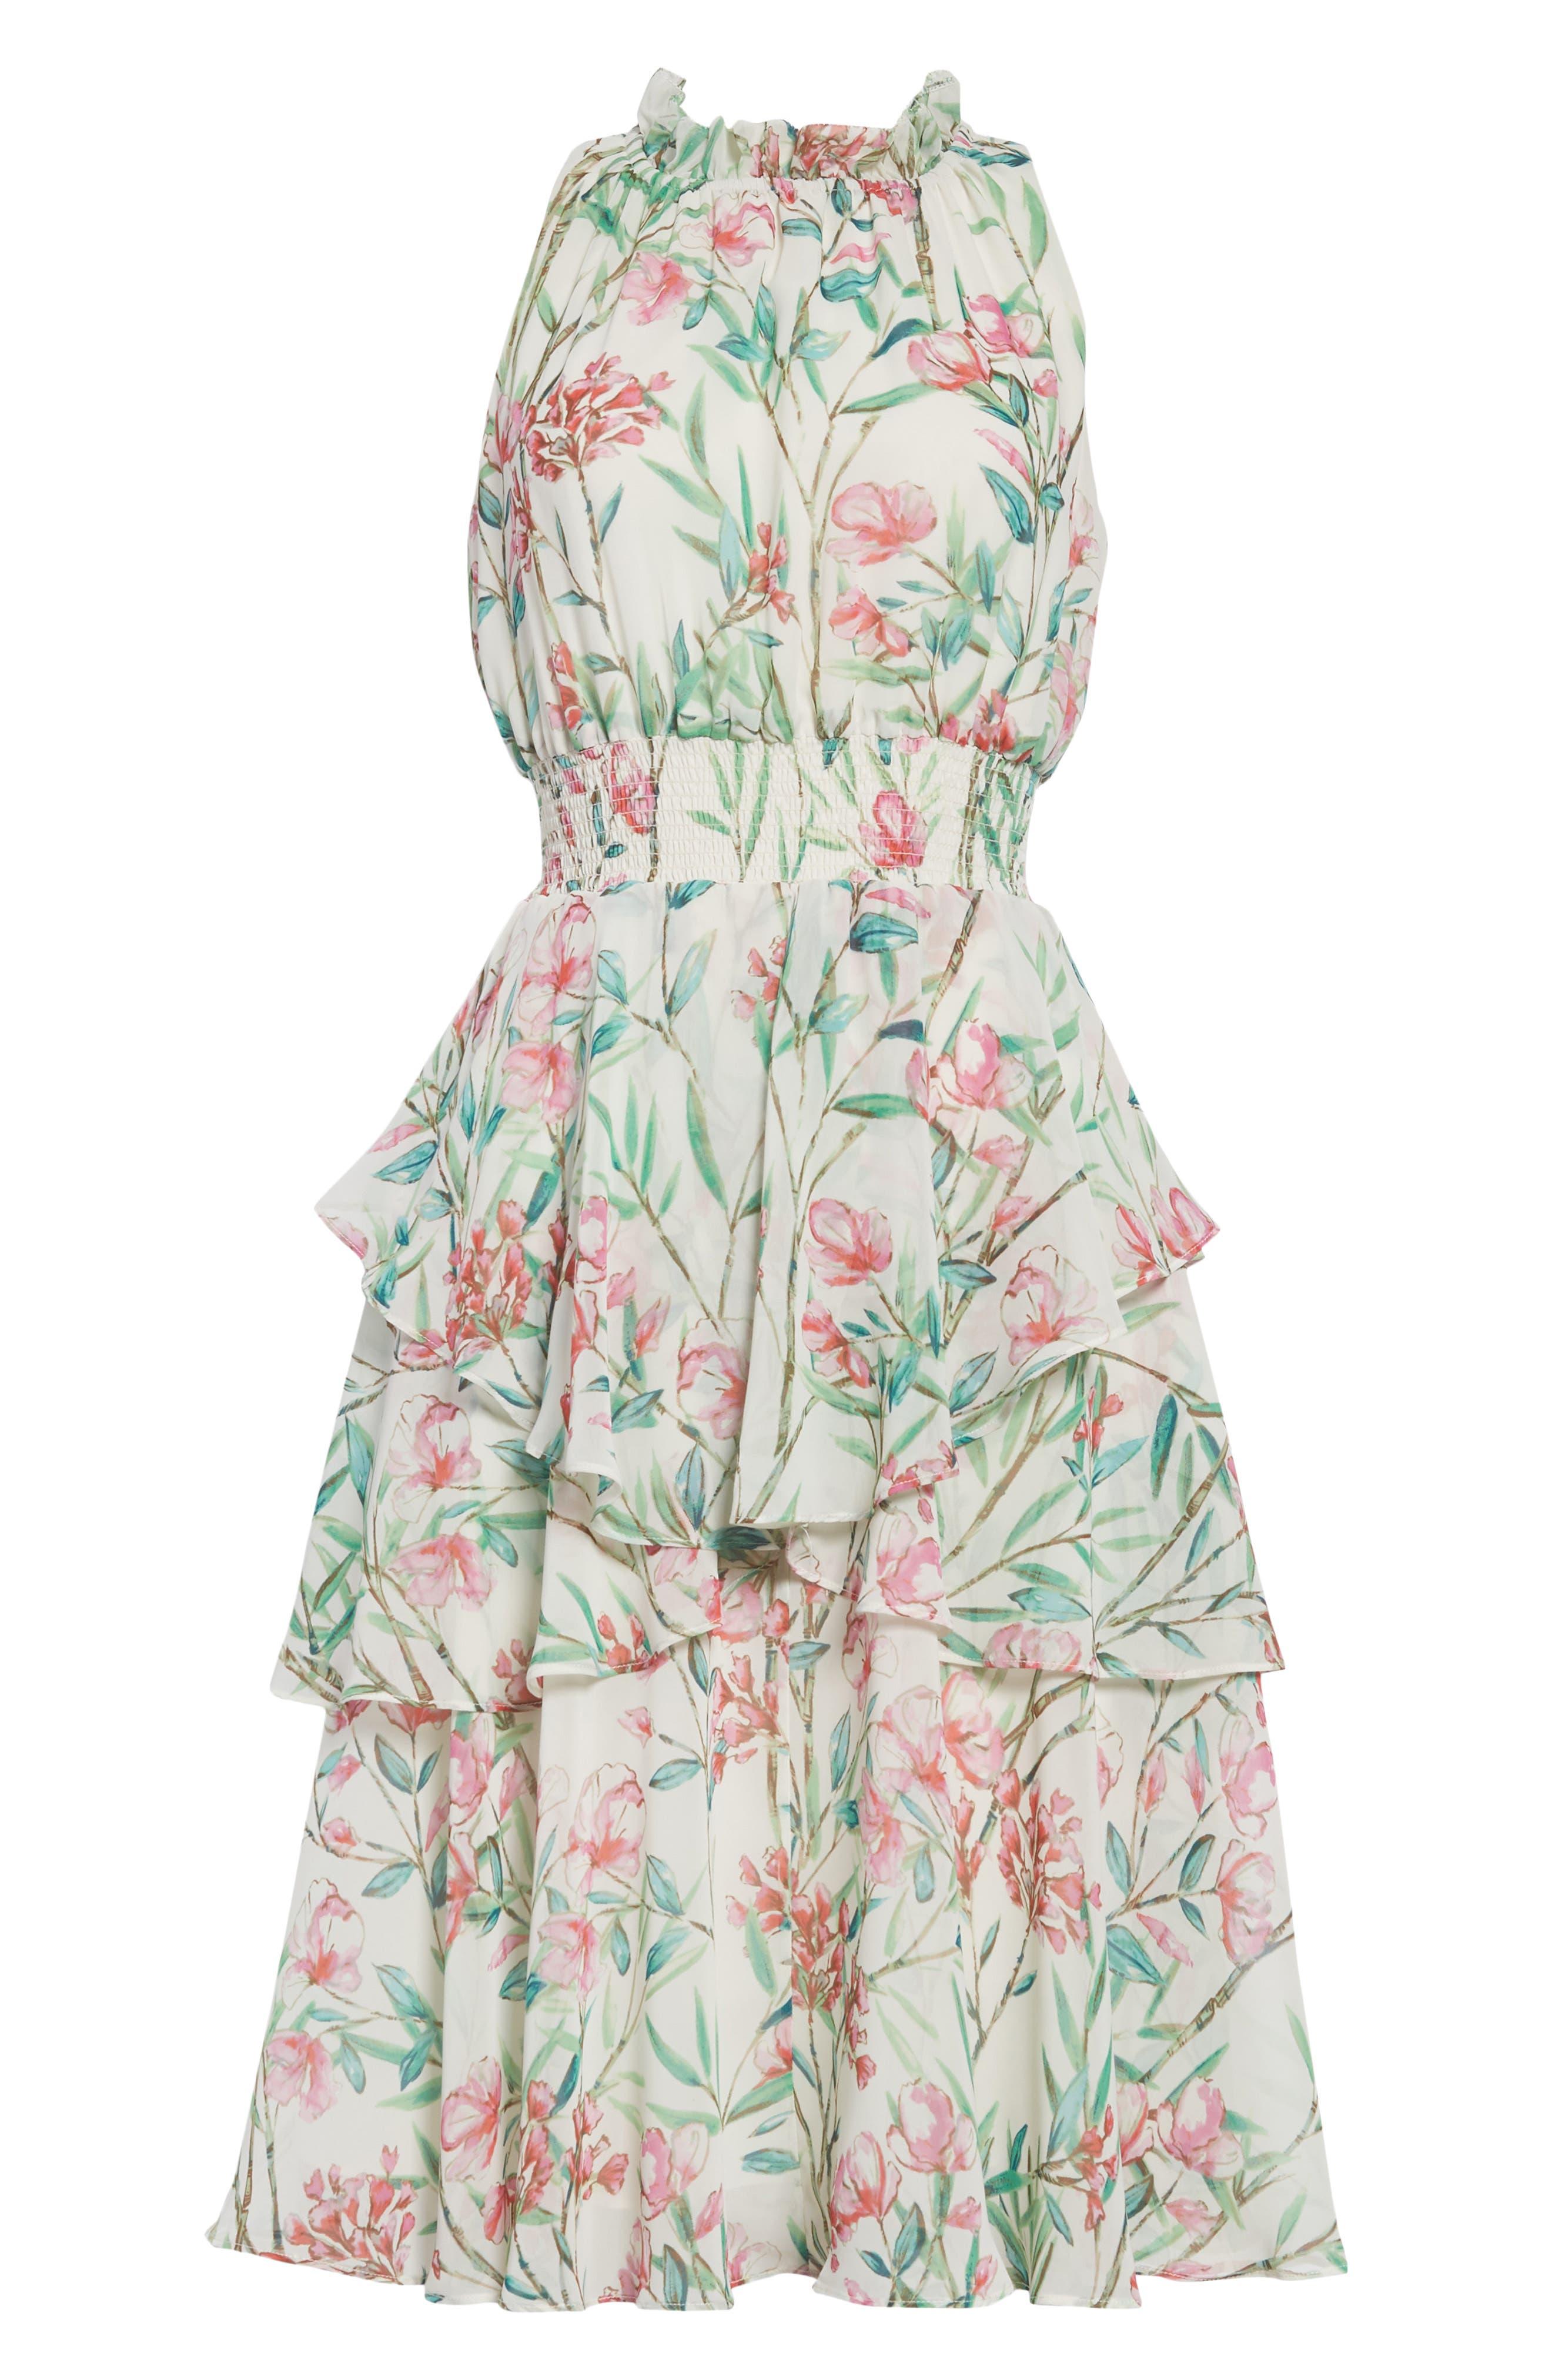 ELIZA J, Chiffon Fit & Flare Dress, Alternate thumbnail 7, color, 901